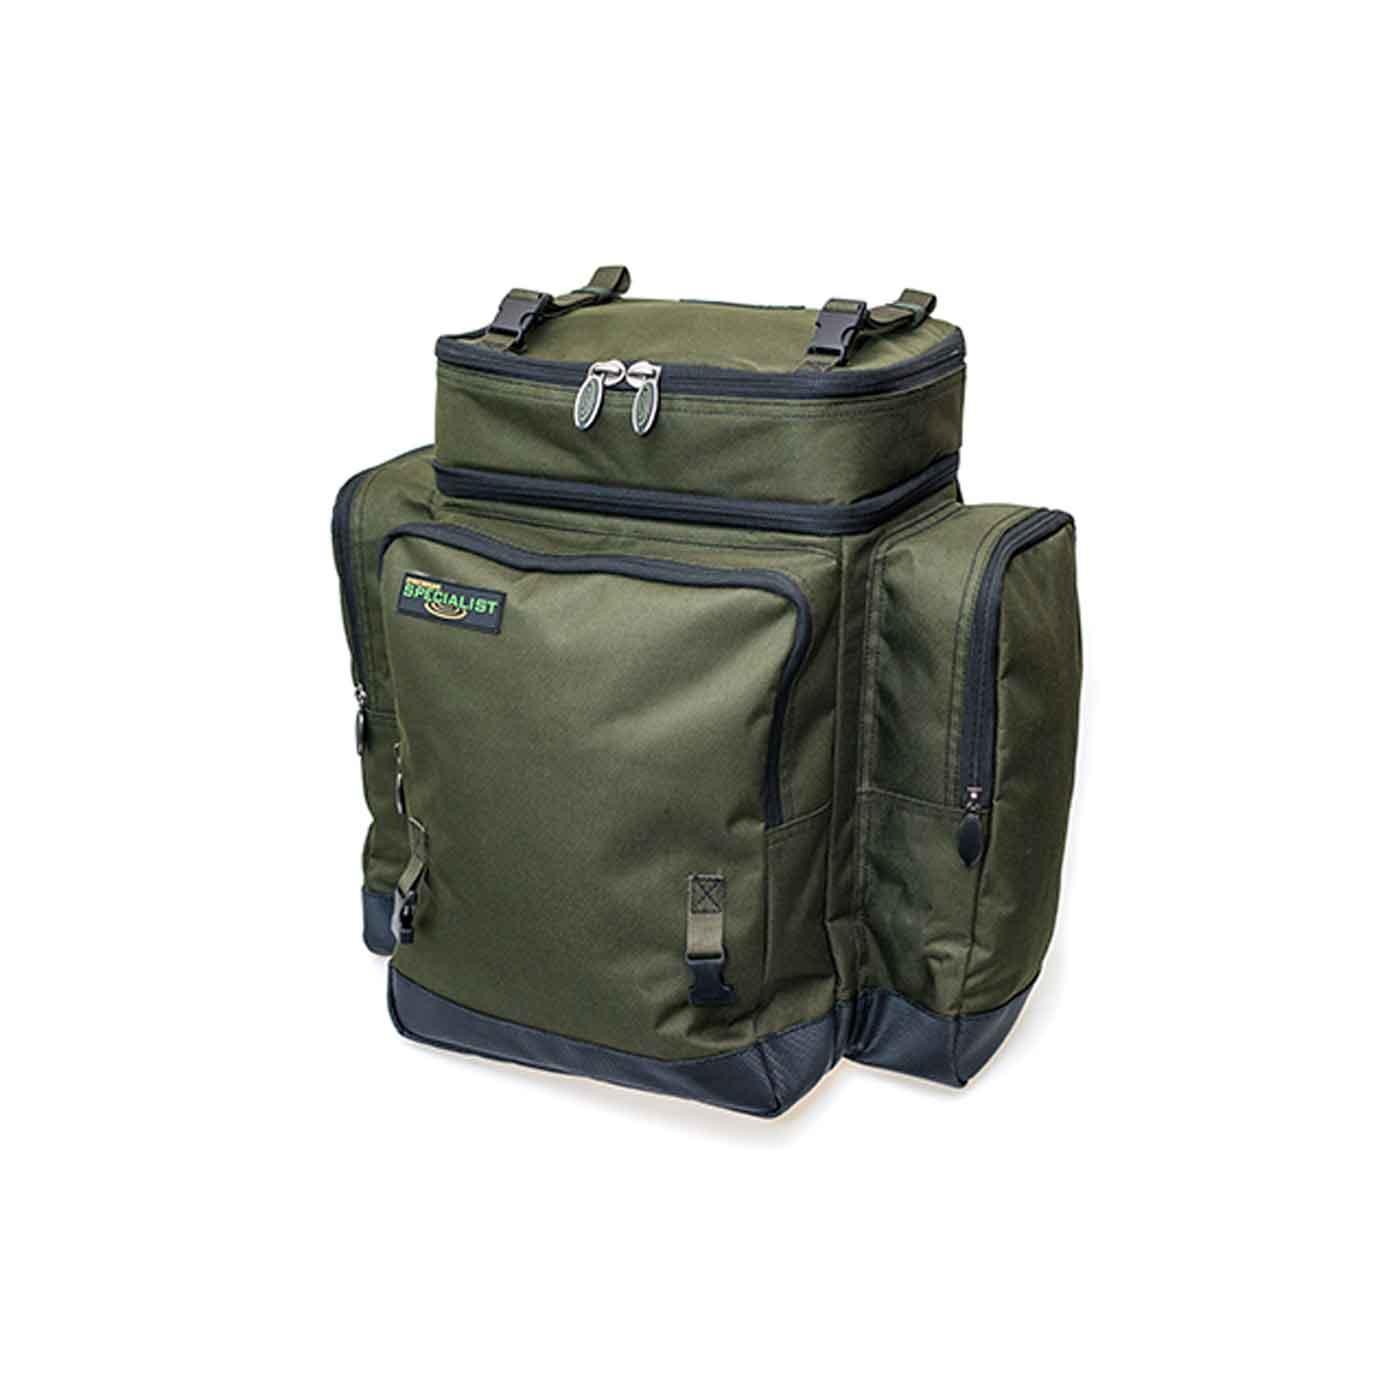 Drennan Specialist Compact Rucksack Medium 40 Ltr